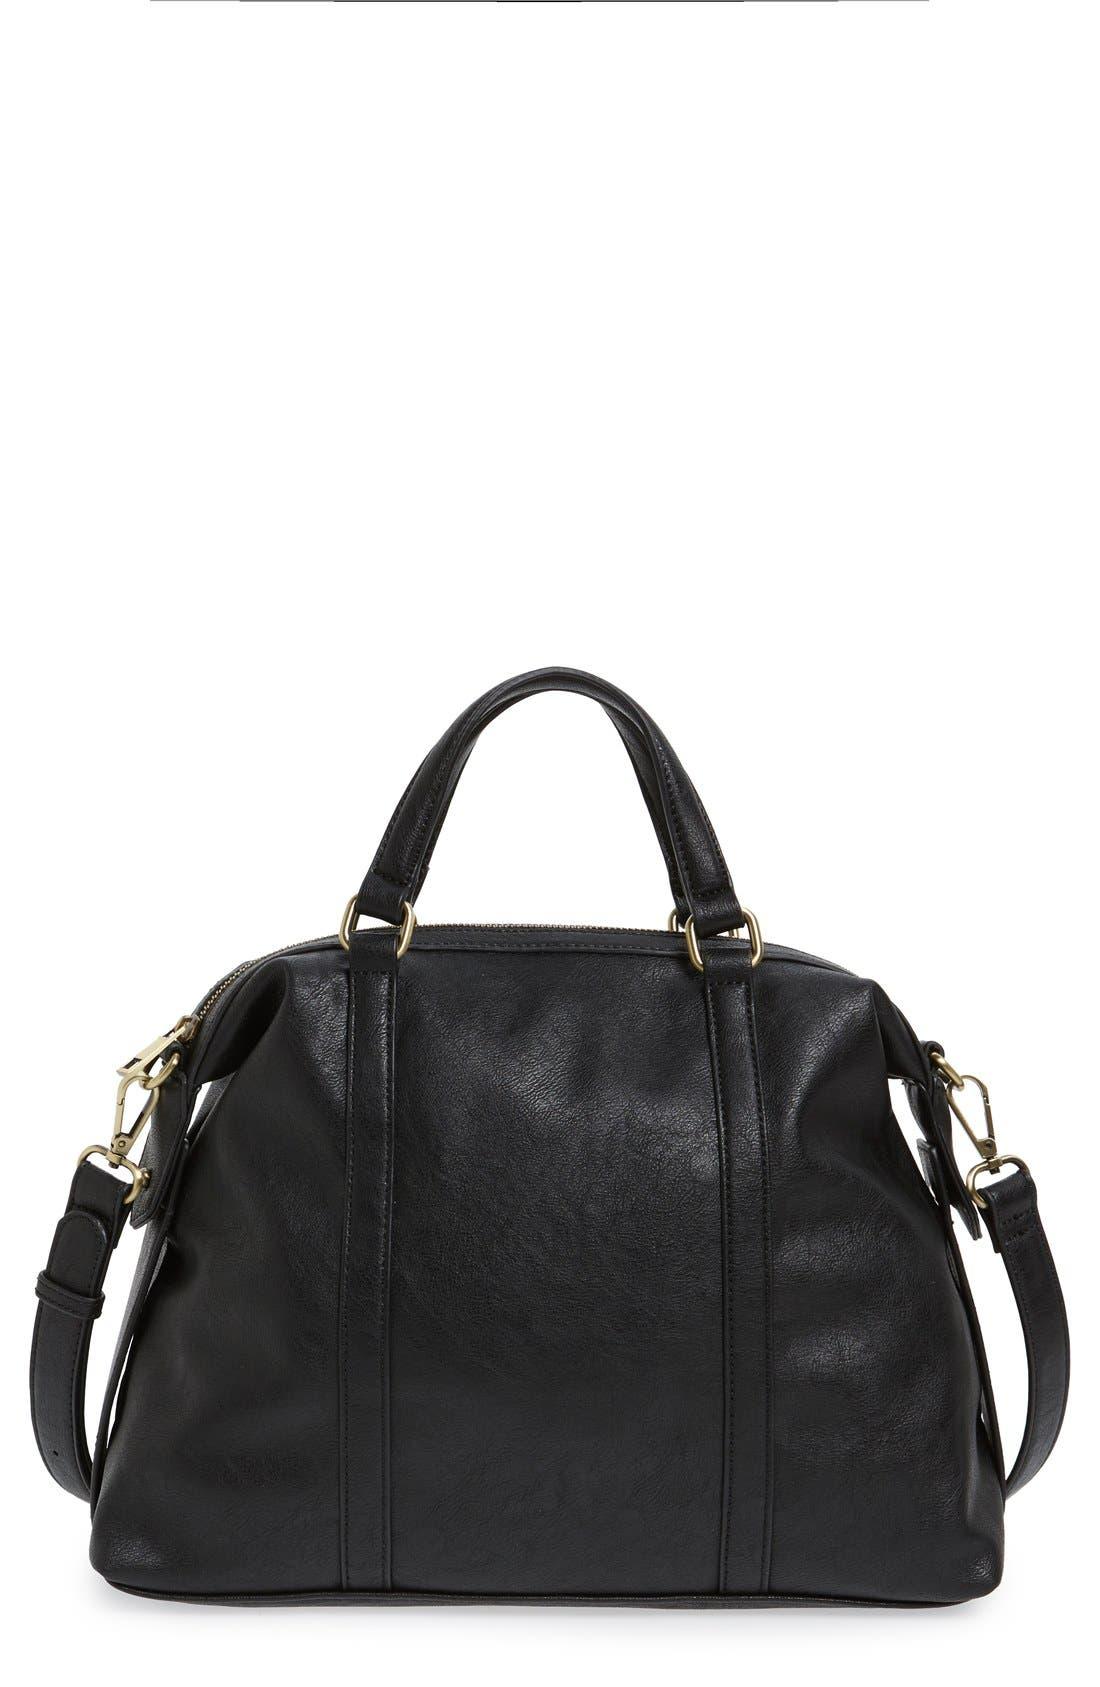 'Oliva' Faux Leather Satchel,                         Main,                         color,